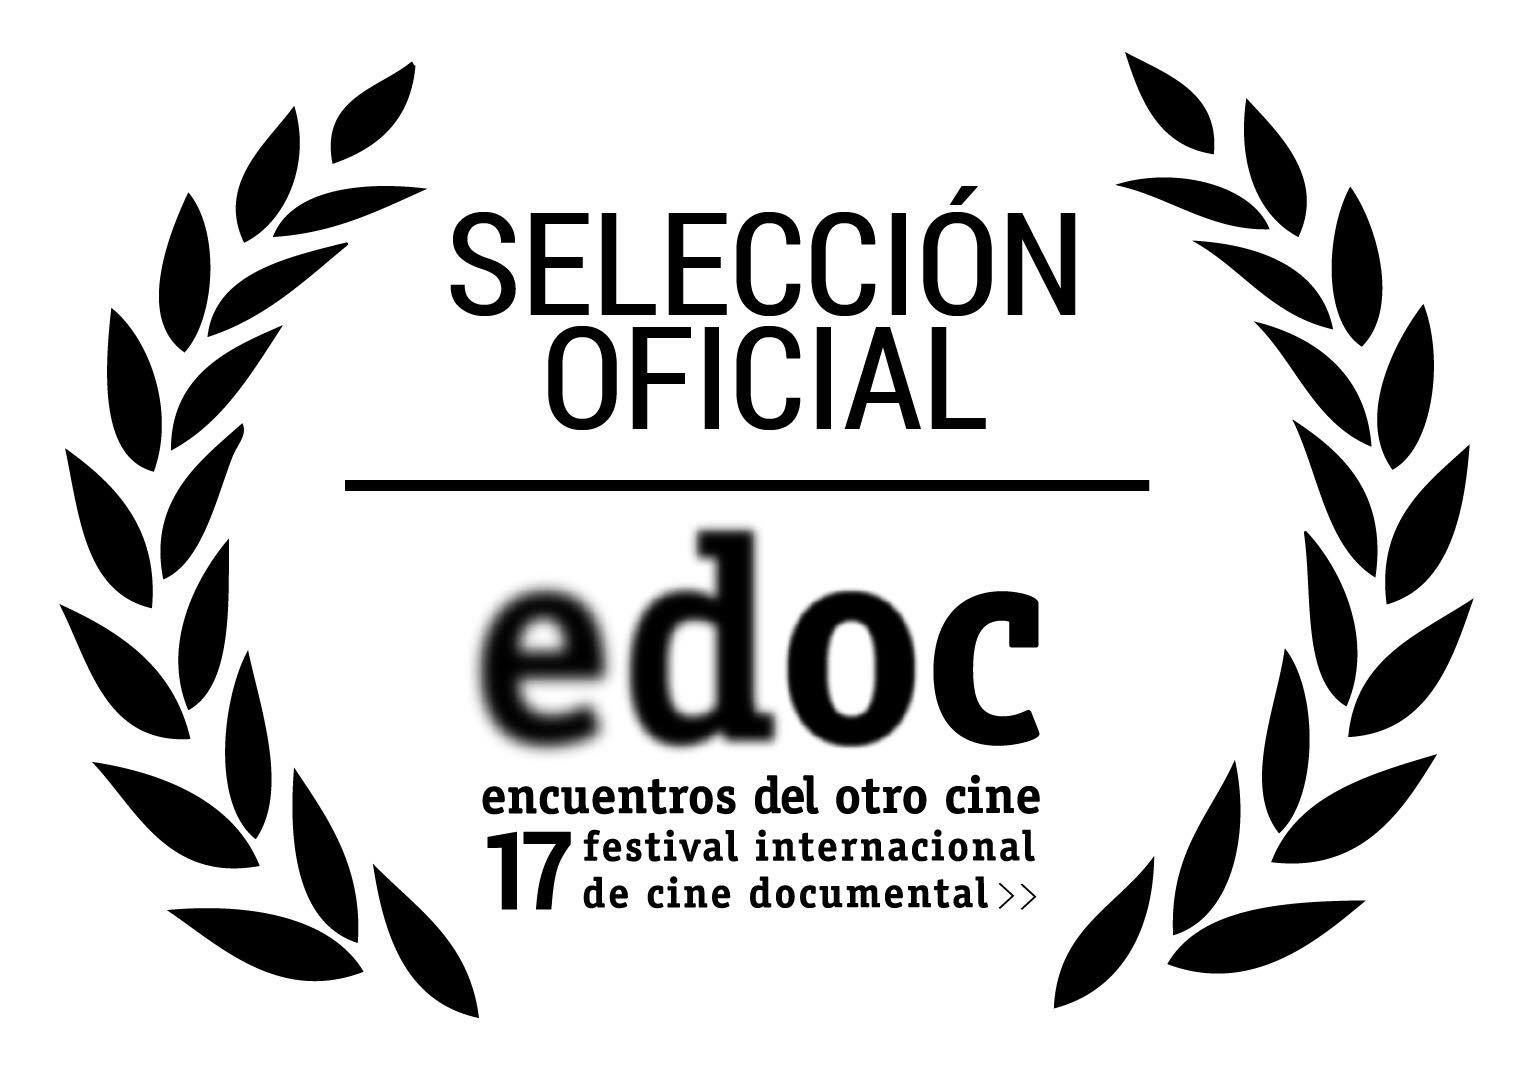 Ecuador! Craigslist Allstars will play at the Festival EDOC - Encuentros del Otro Cine this month: 10th - Ocho y Medio in Quito 15th - Incine in Quito 20th- TEATRO MUEGANO in Guayaquil 🇪🇨 festivaledoc.org/programas/craigslist-allstar